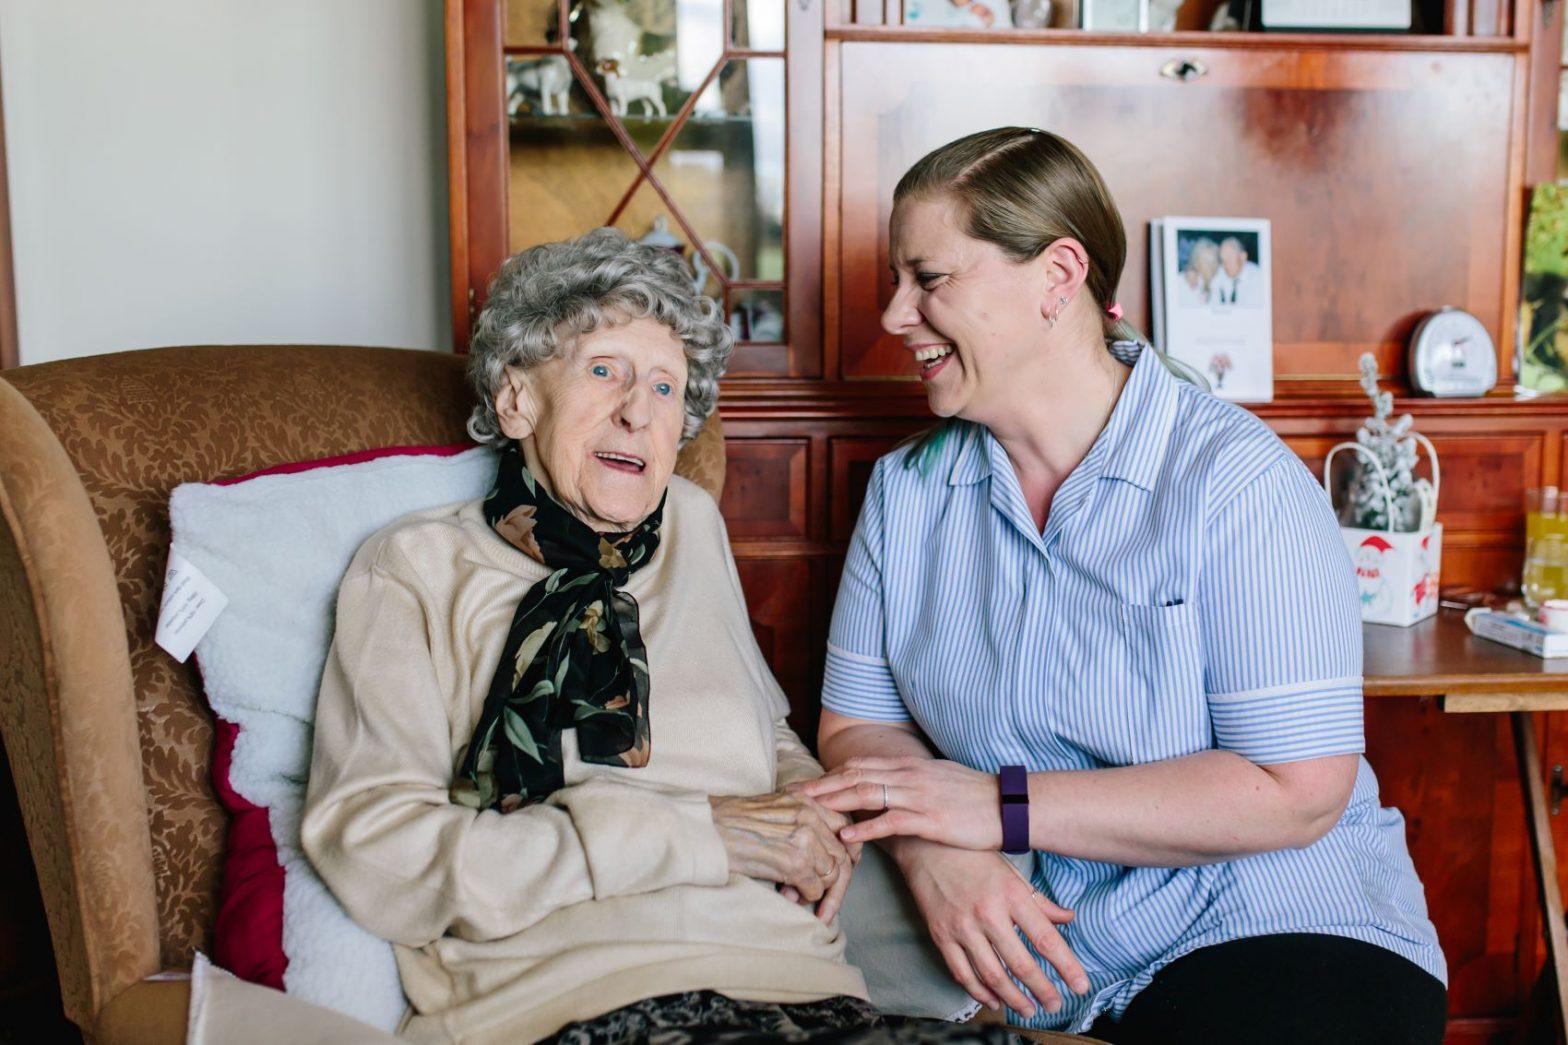 Care-services-care-assessments-tunbridge-wells-kent-homecare